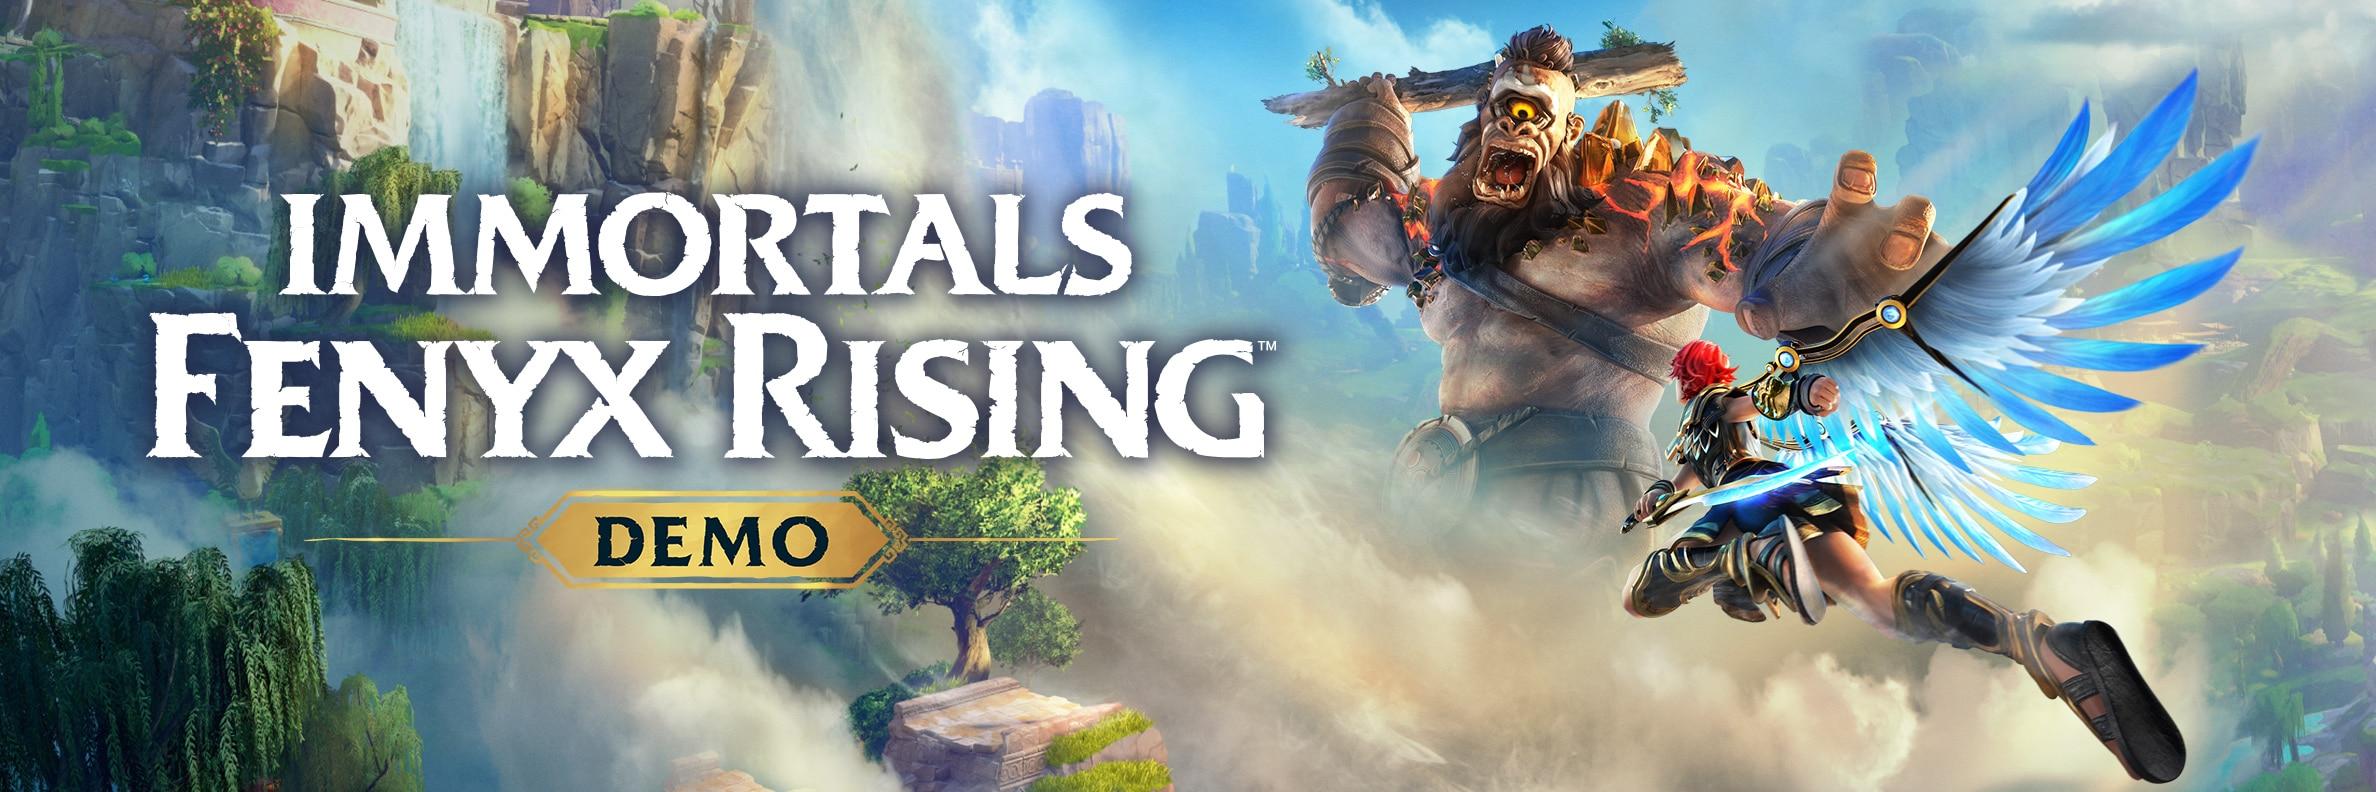 Generic Immortals Fenyx Rising Demo banner